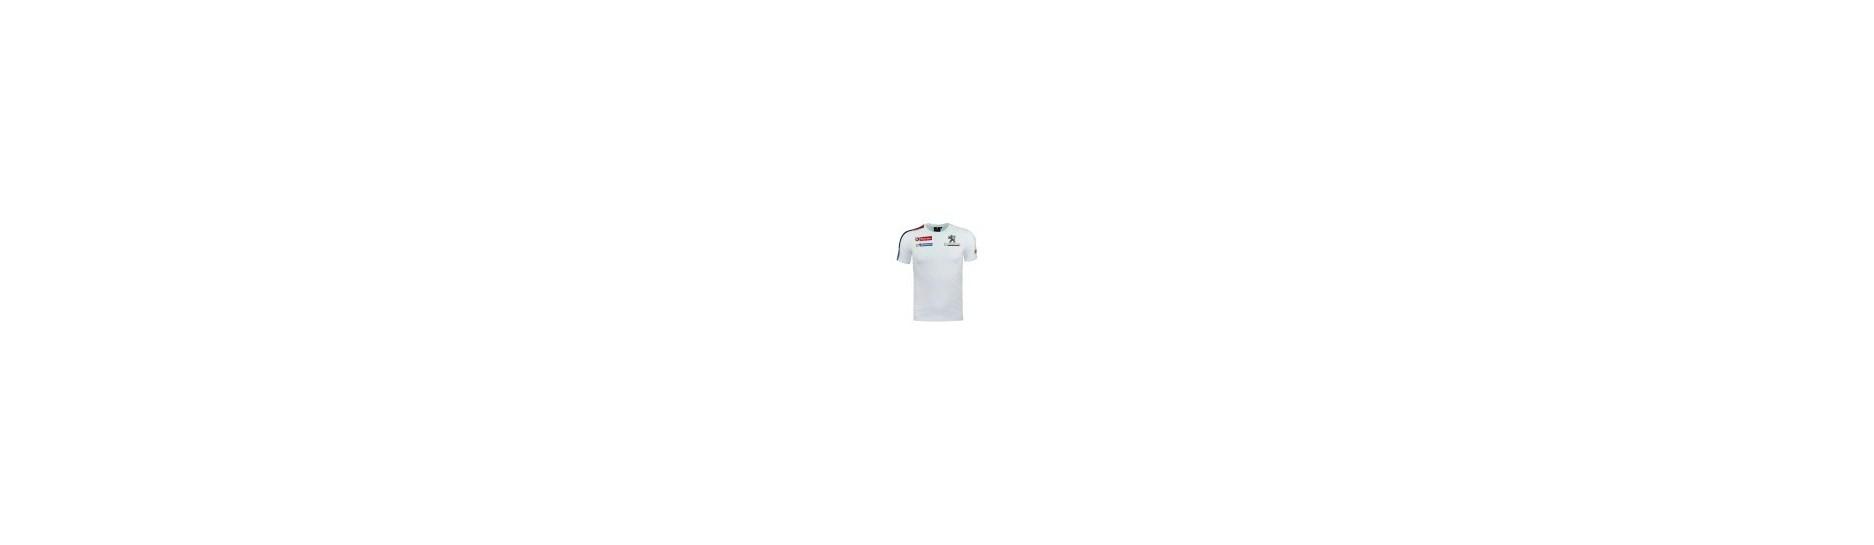 Peugeot t-shirts and shirts